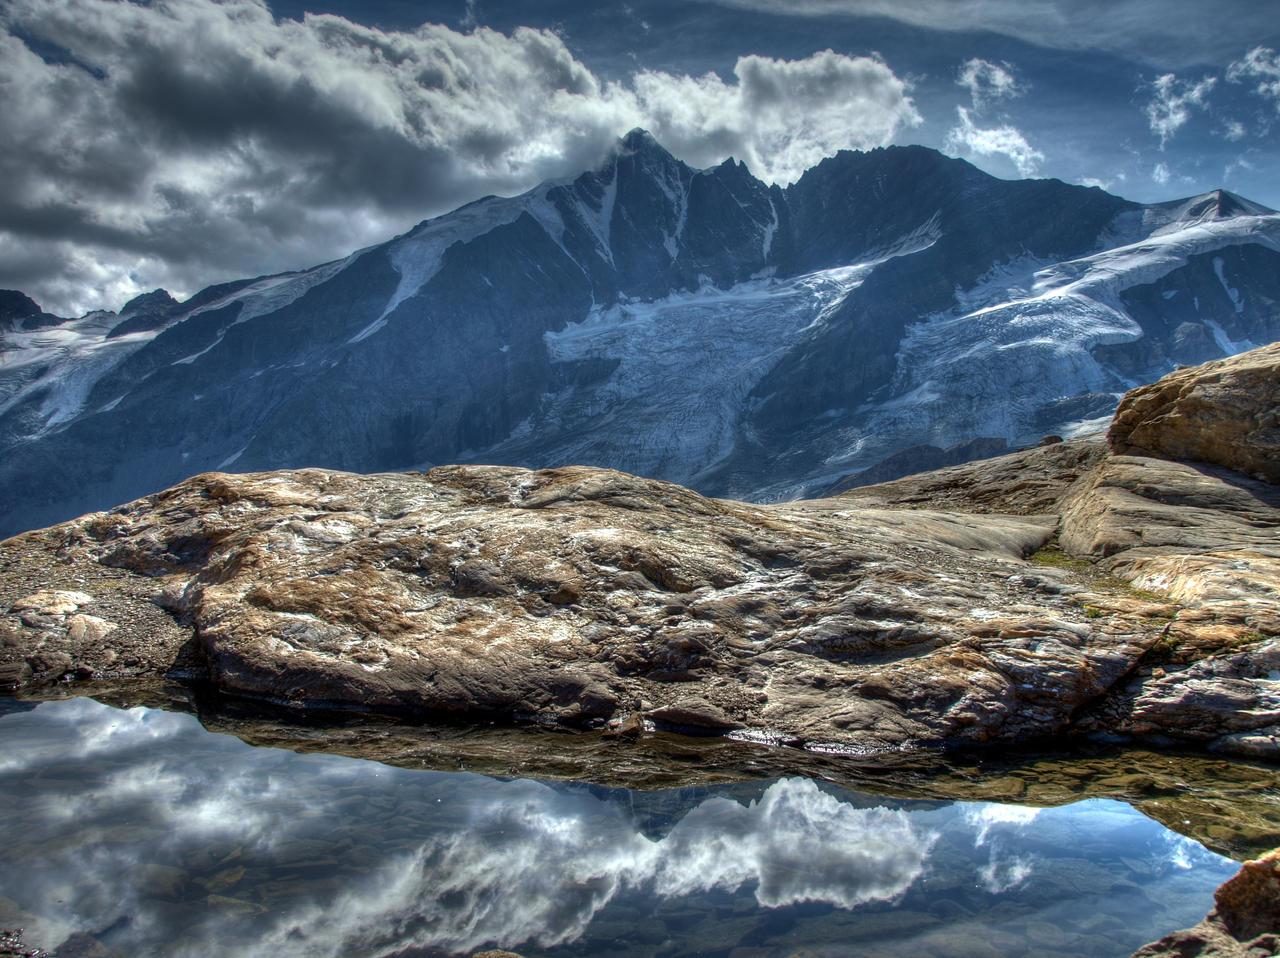 Silent Water by Burtn